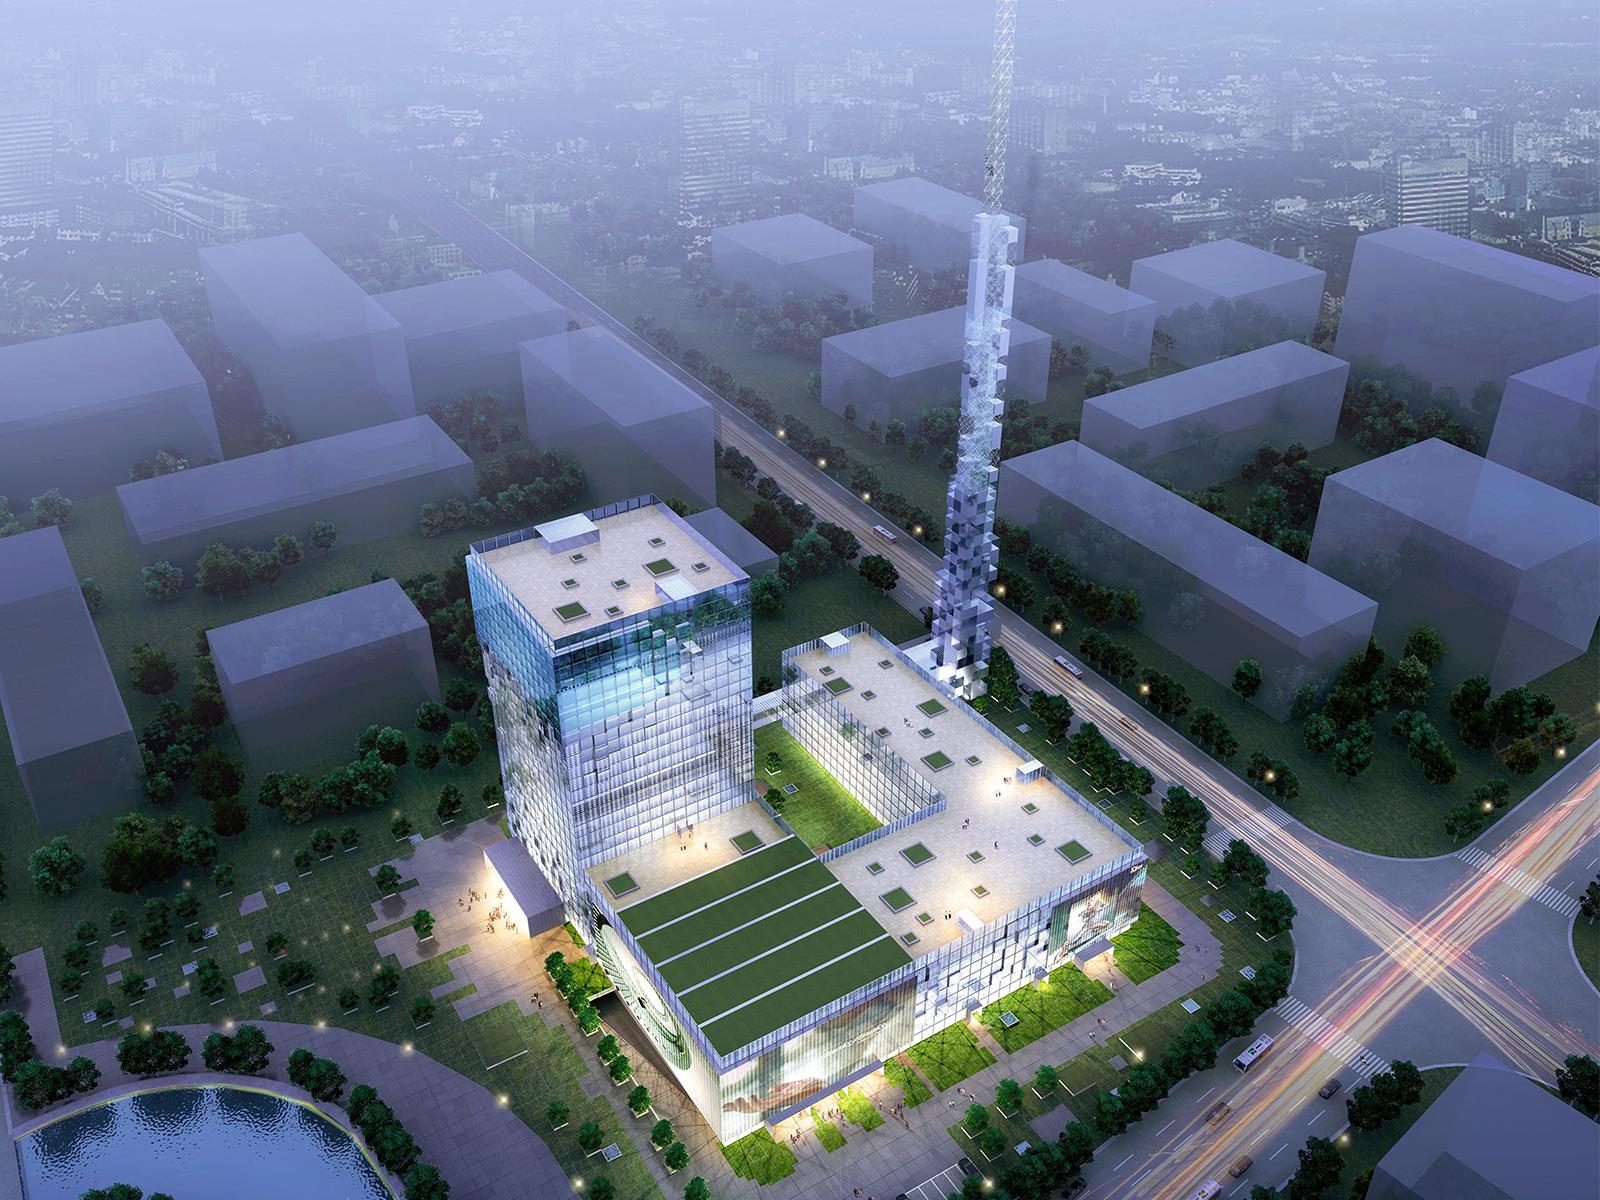 浦东文化广播电视中心_Pudong New District Broadcast TV Centre_Right_02.jpg